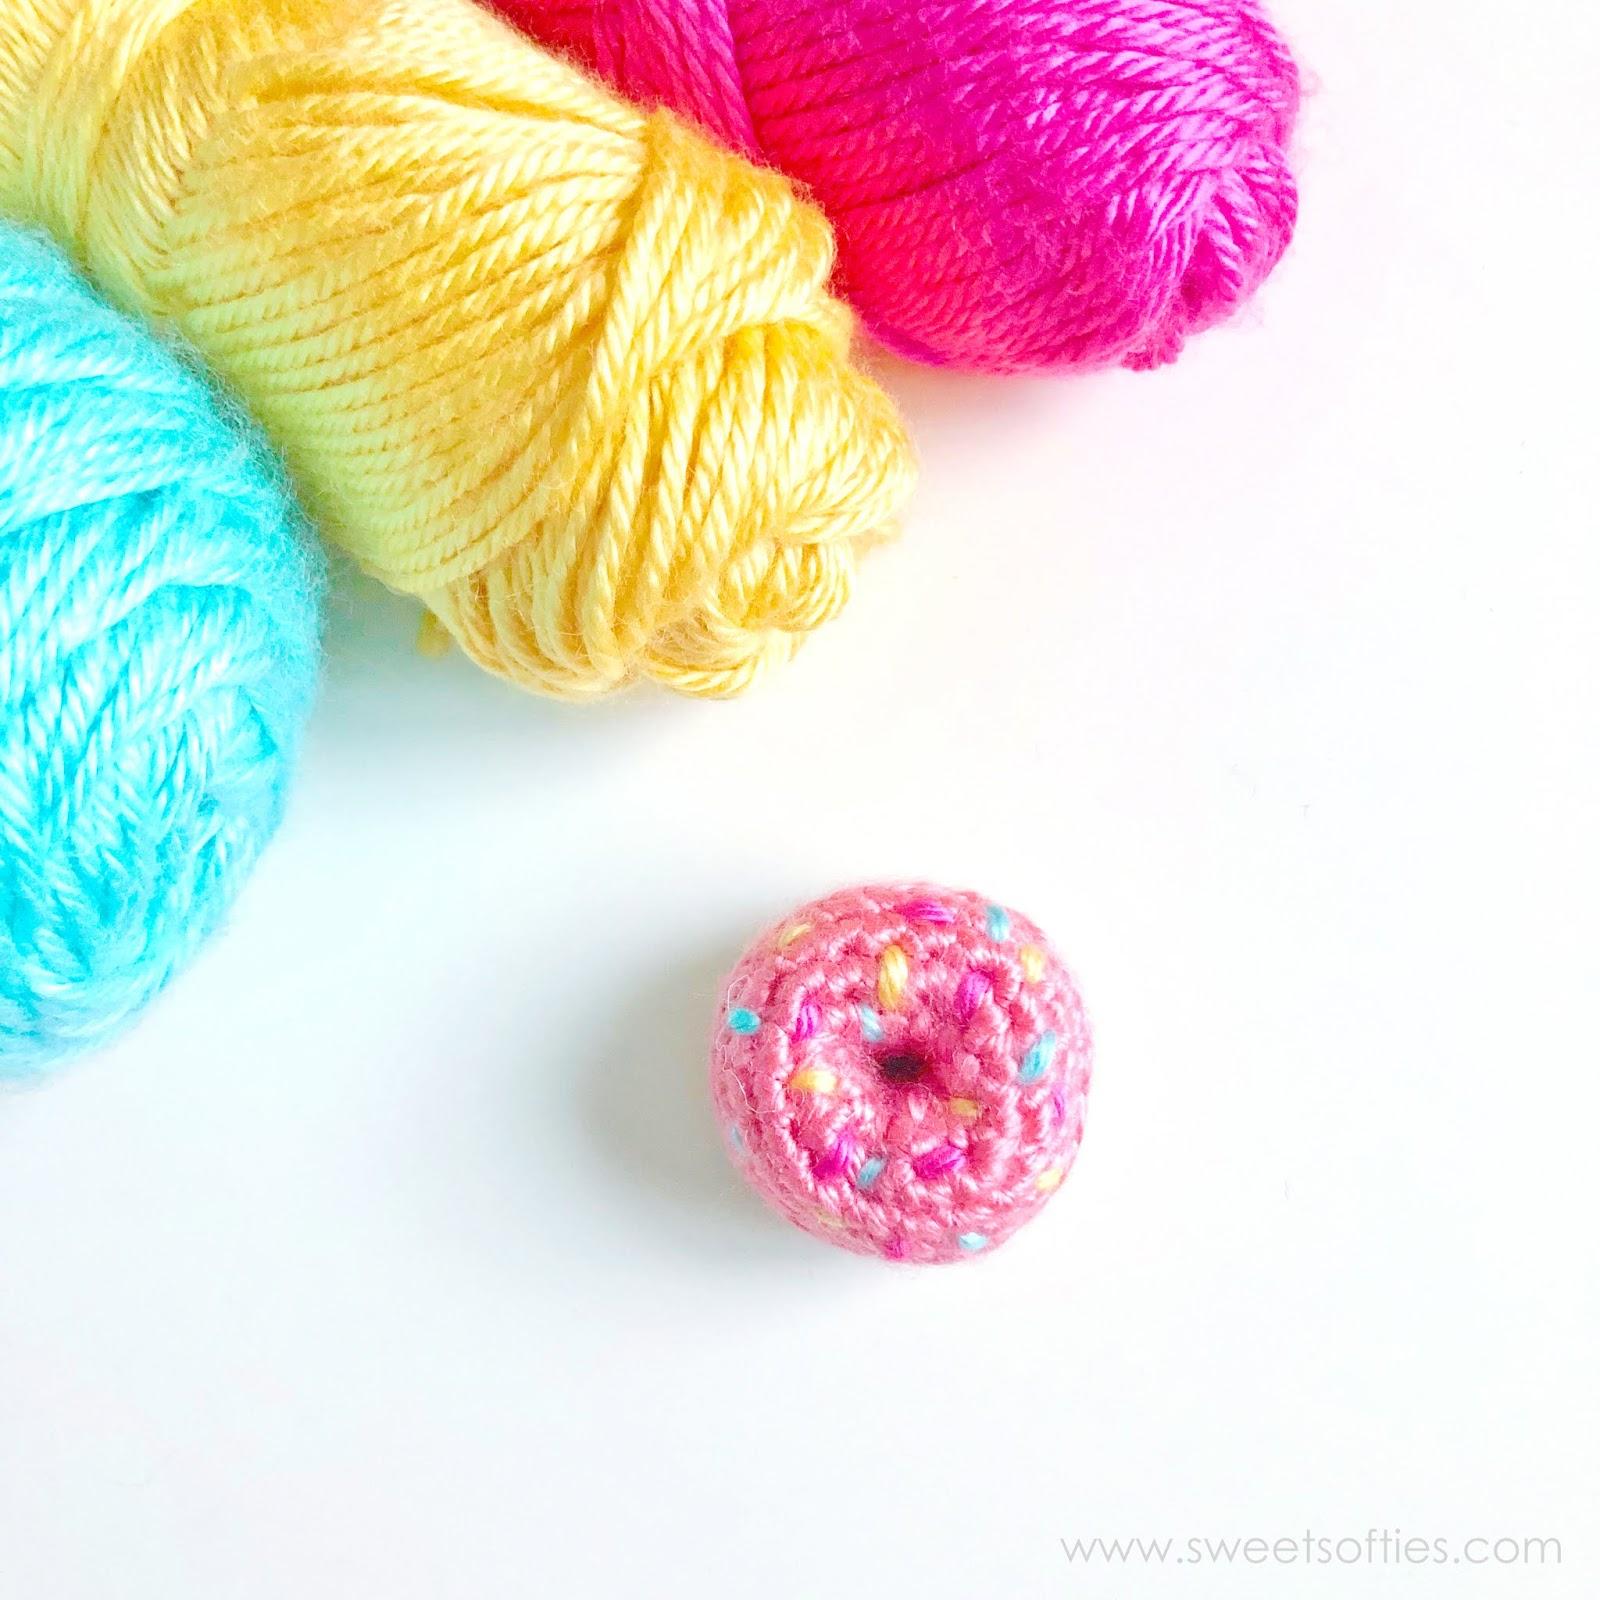 3 Donut Keychains, Crochet Donuts, 3 Donut Key Ring, Charms ...   1600x1600